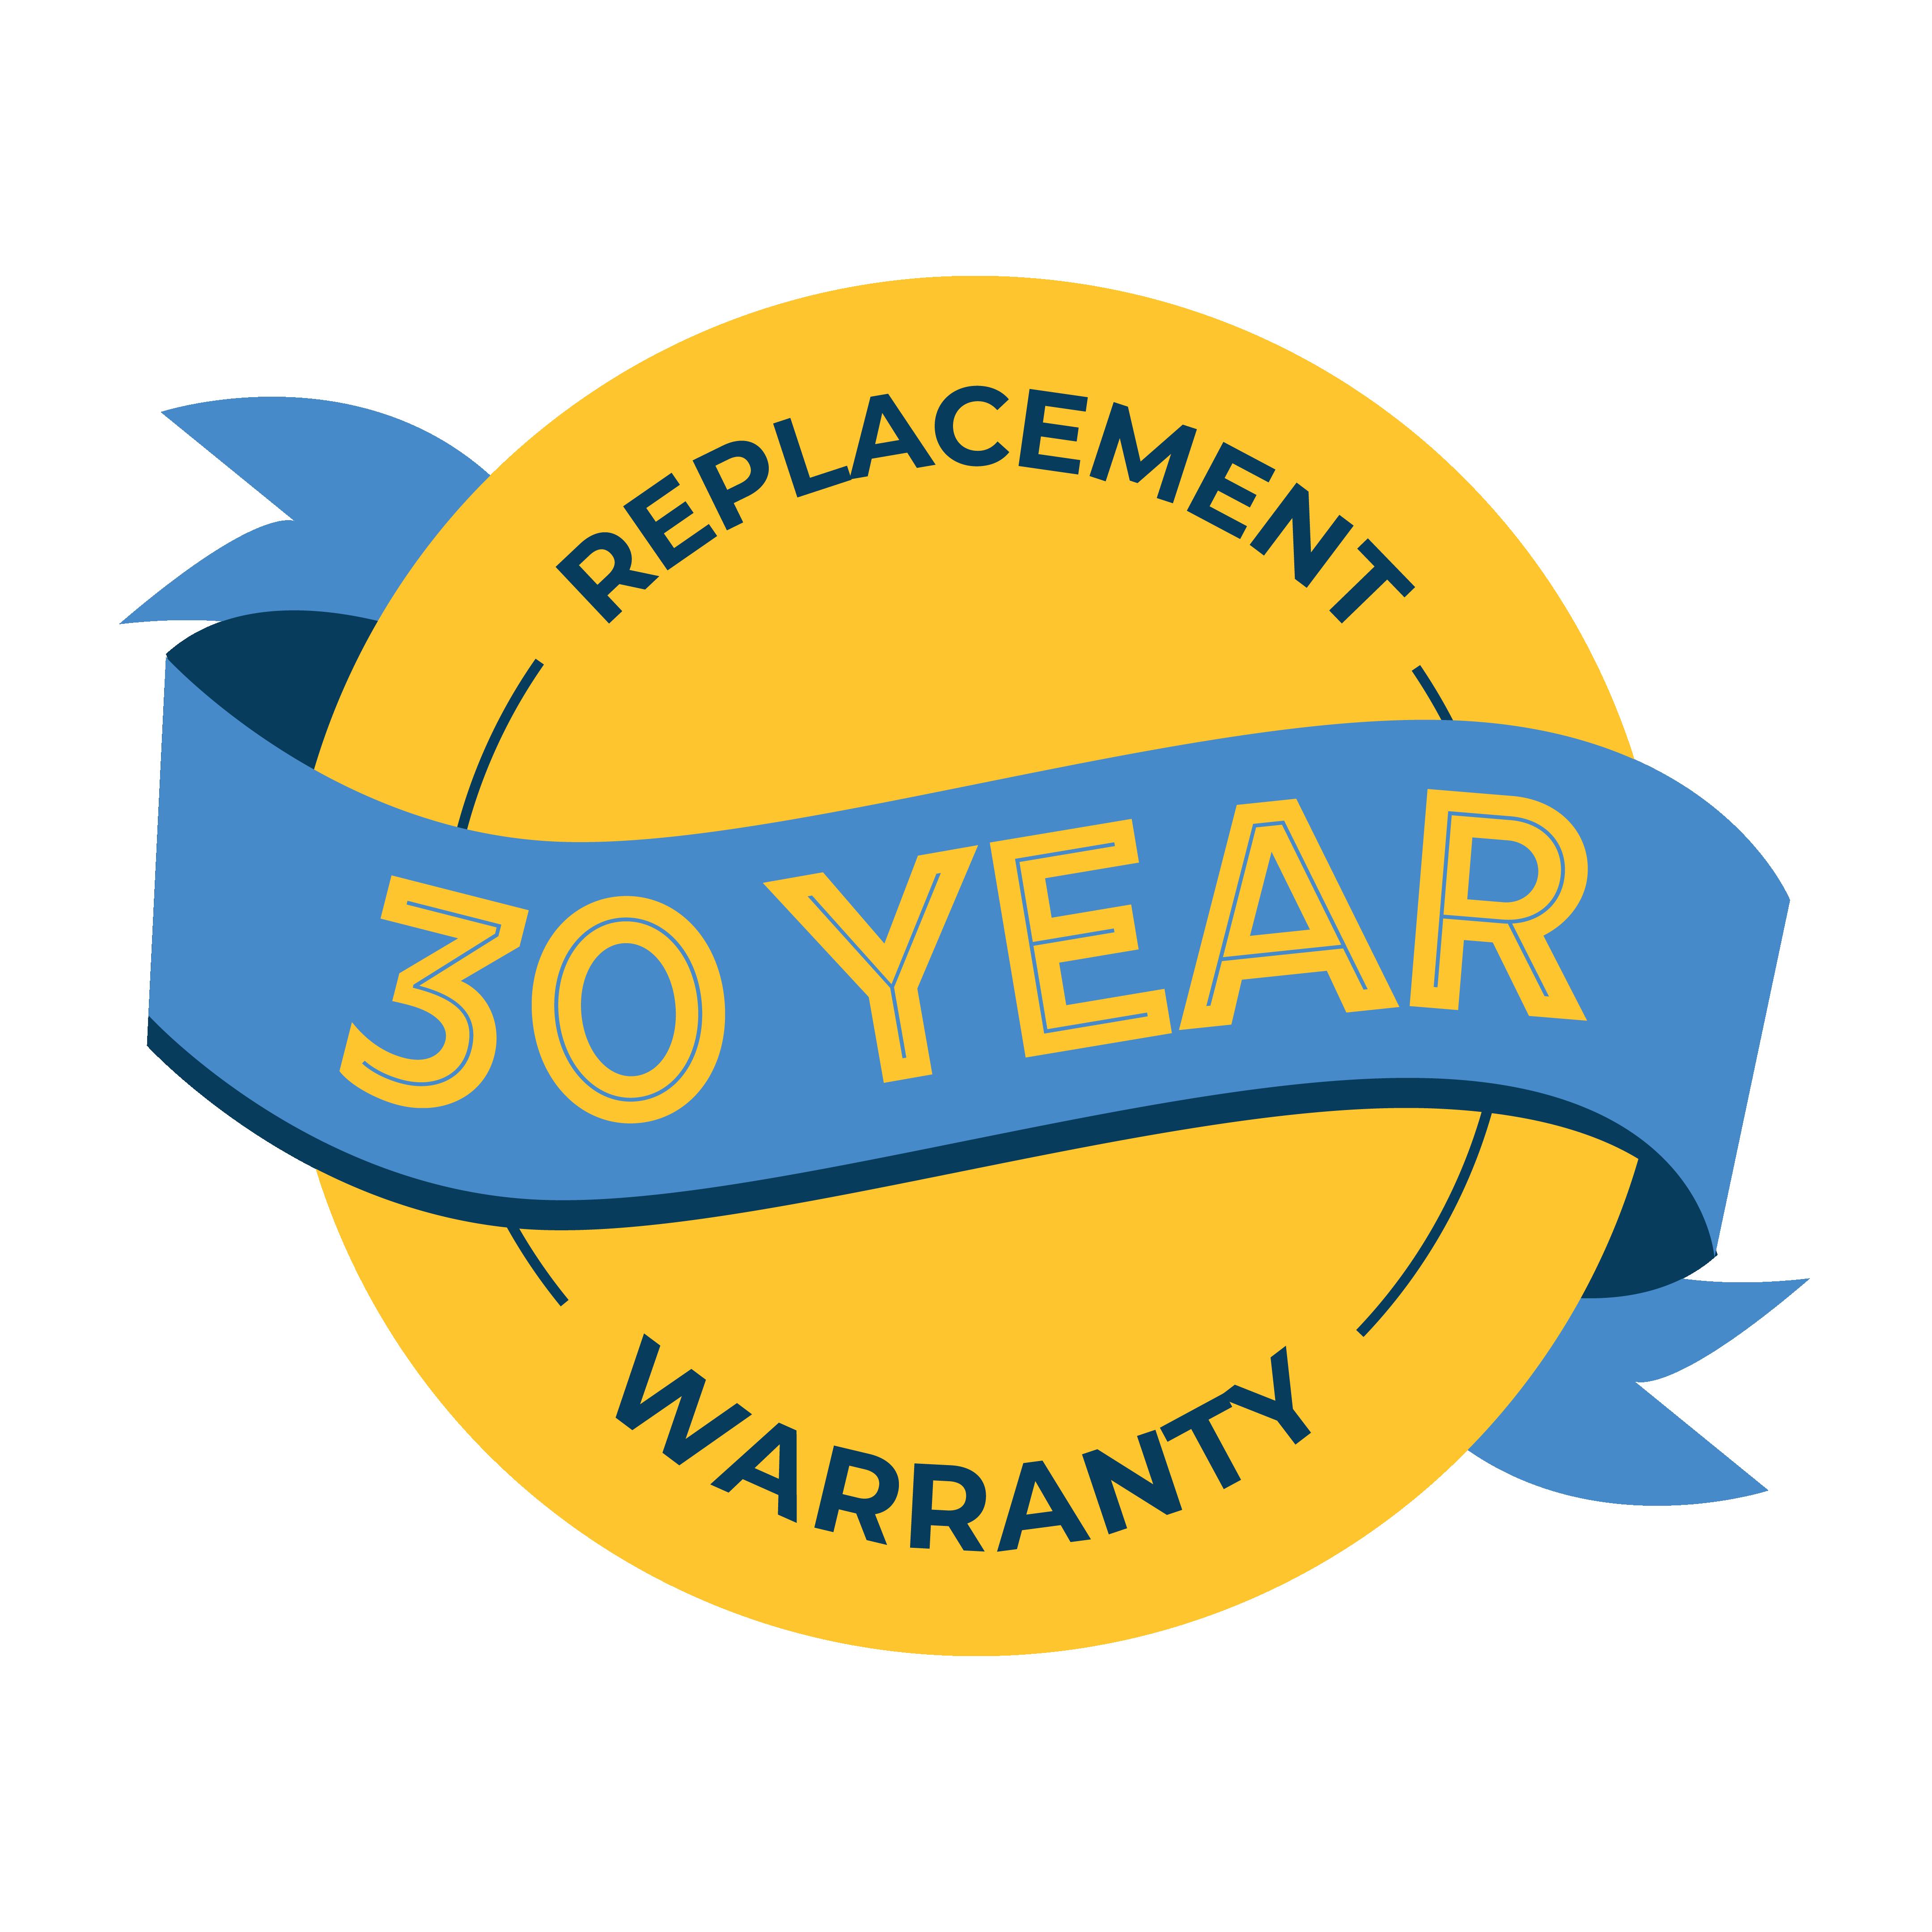 Innosys Power Surge Protection Warranty, Image of Warranty logo